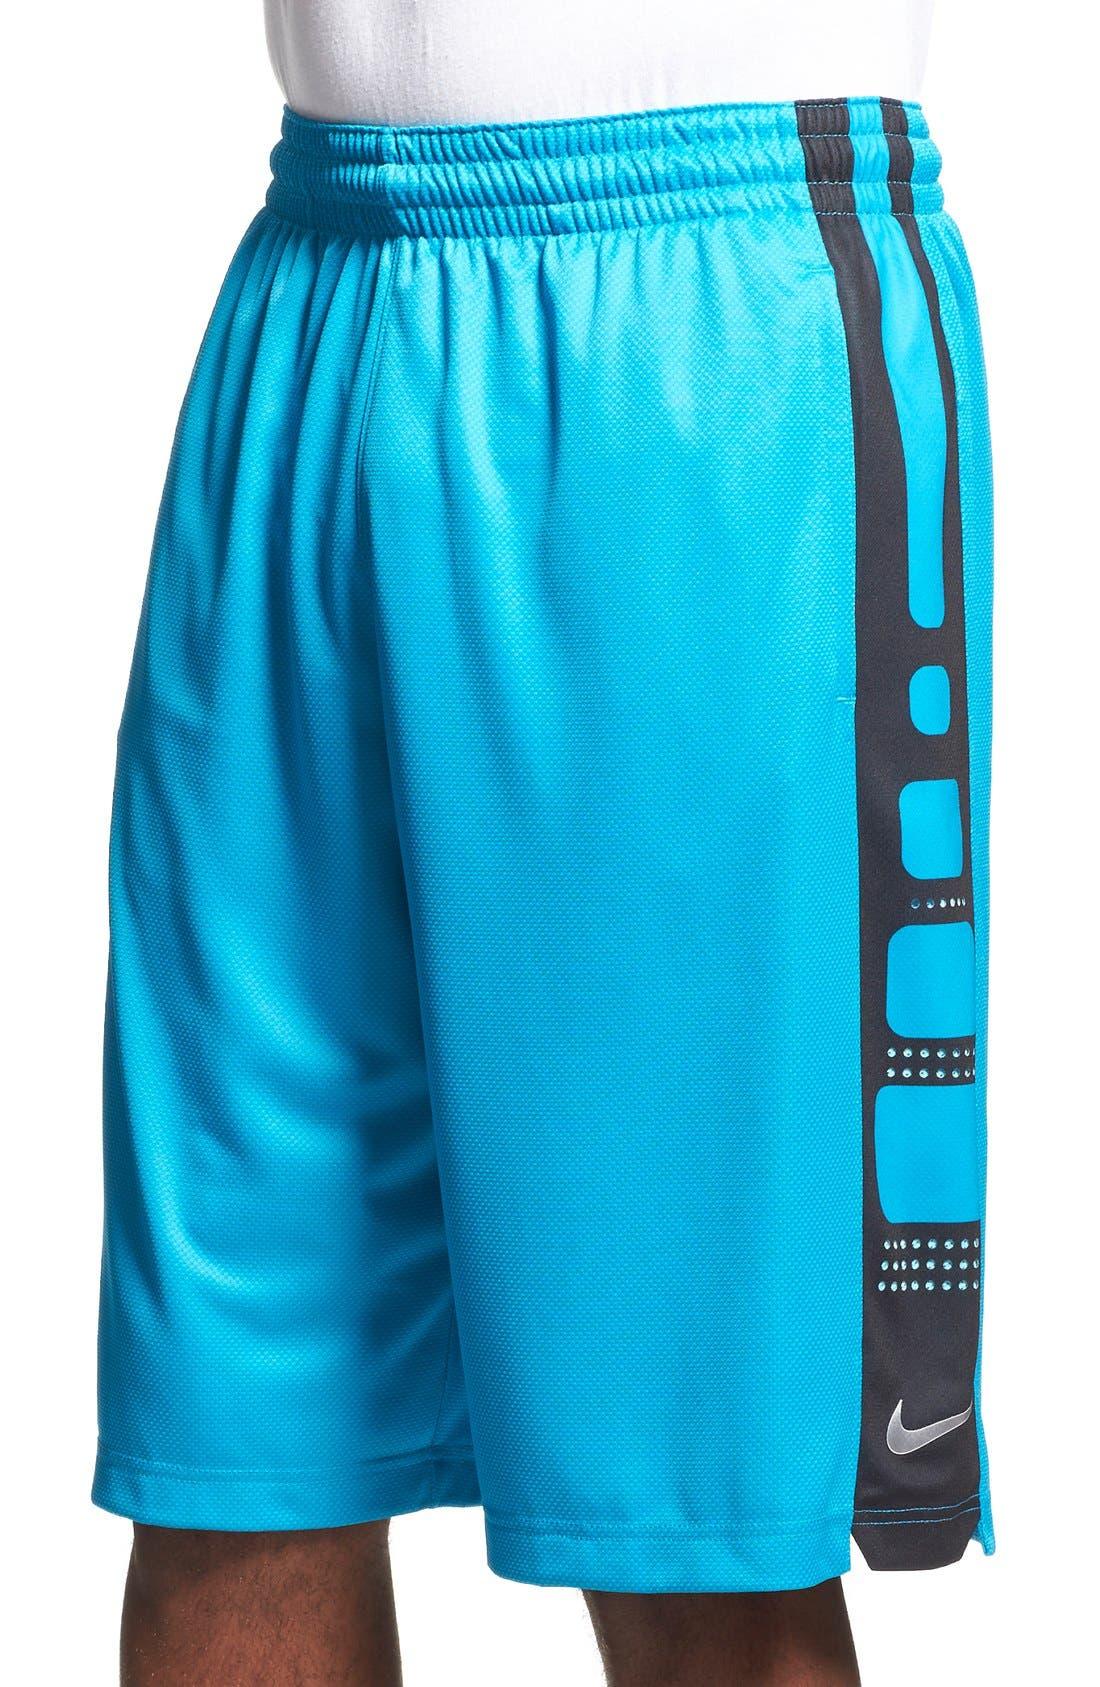 Alternate Image 1 Selected - Nike 'Elite' Knit Basketball Shorts